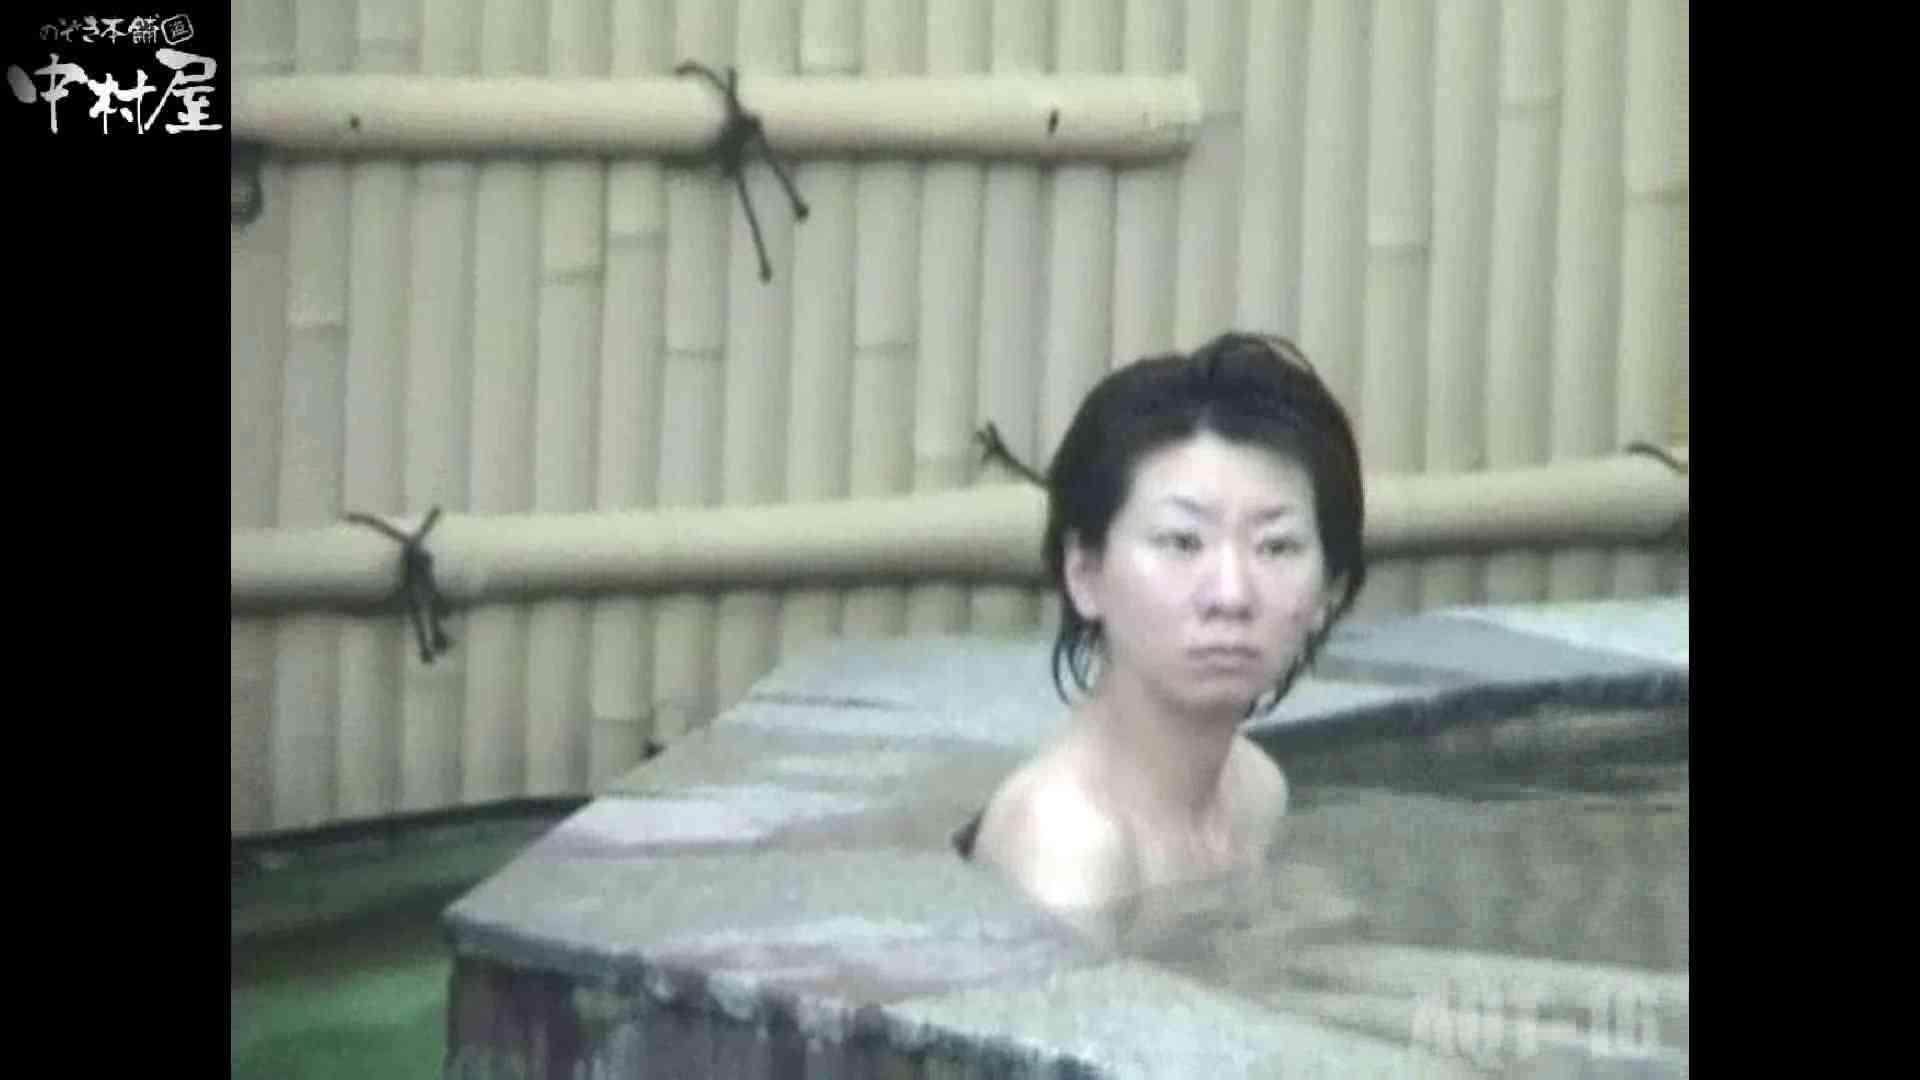 Aquaな露天風呂Vol.880潜入盗撮露天風呂十六判湯 其の三 潜入画像 | 露天  78画像 49